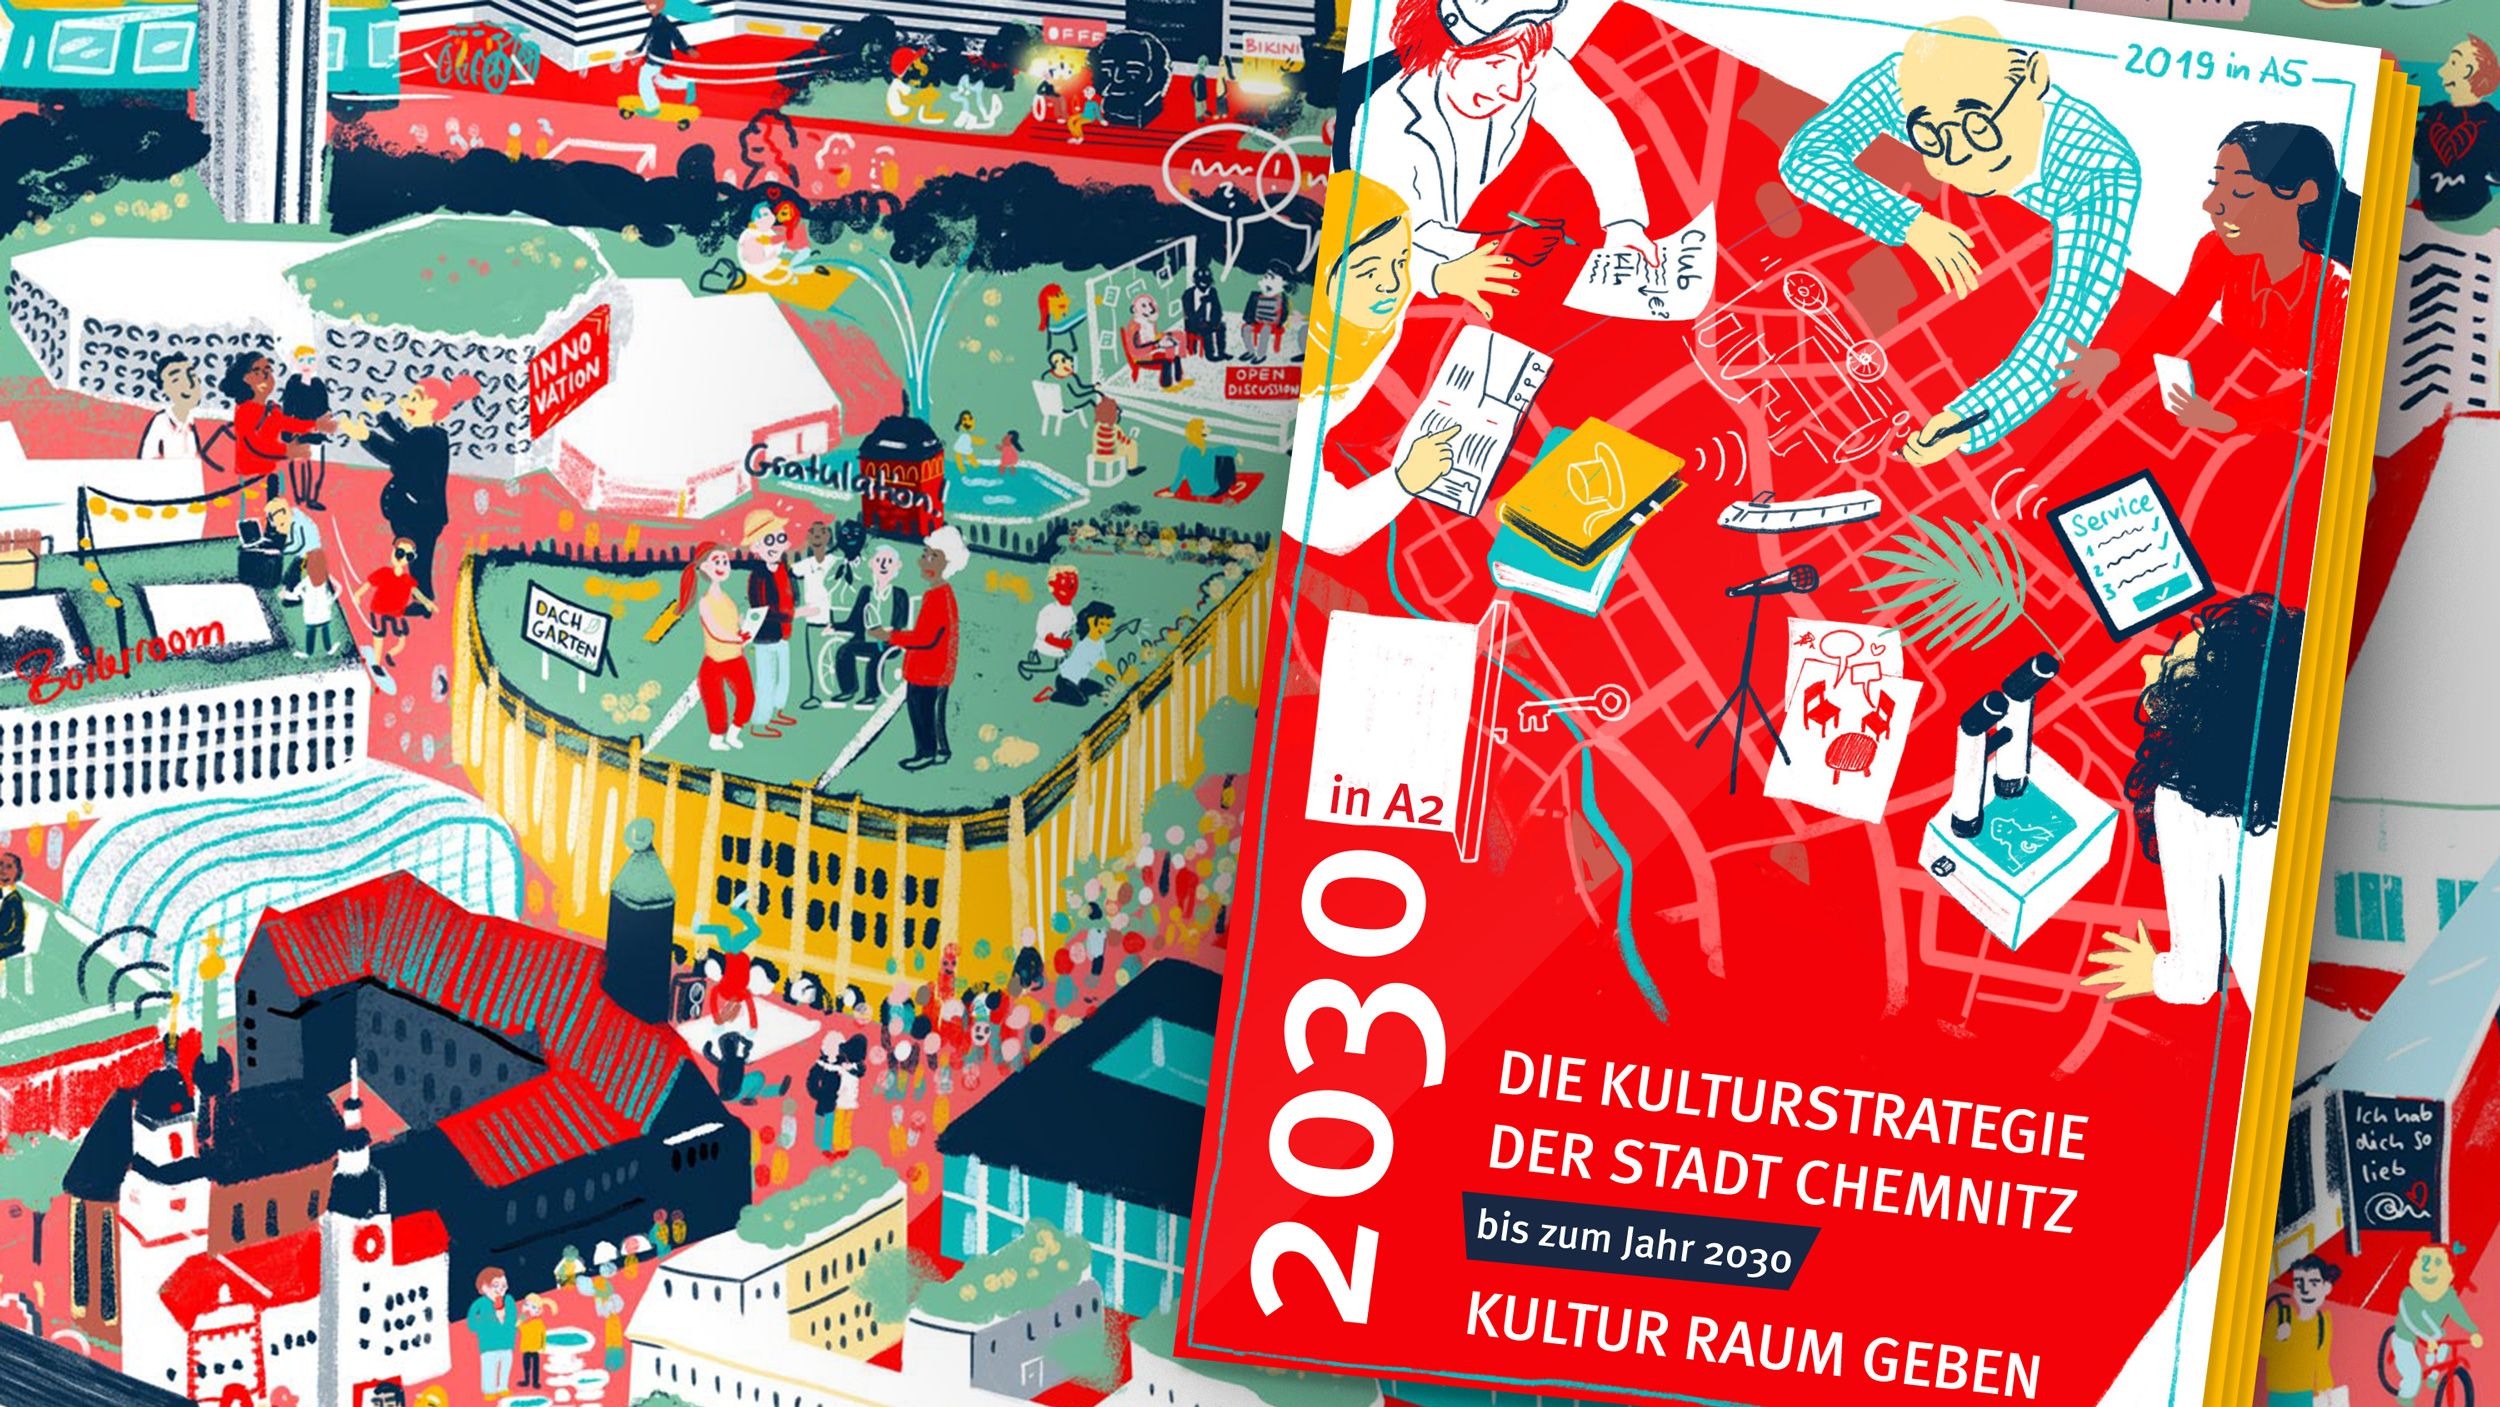 Kulturstrategie der Stadt Chemnitz   Stadt Chemnitz